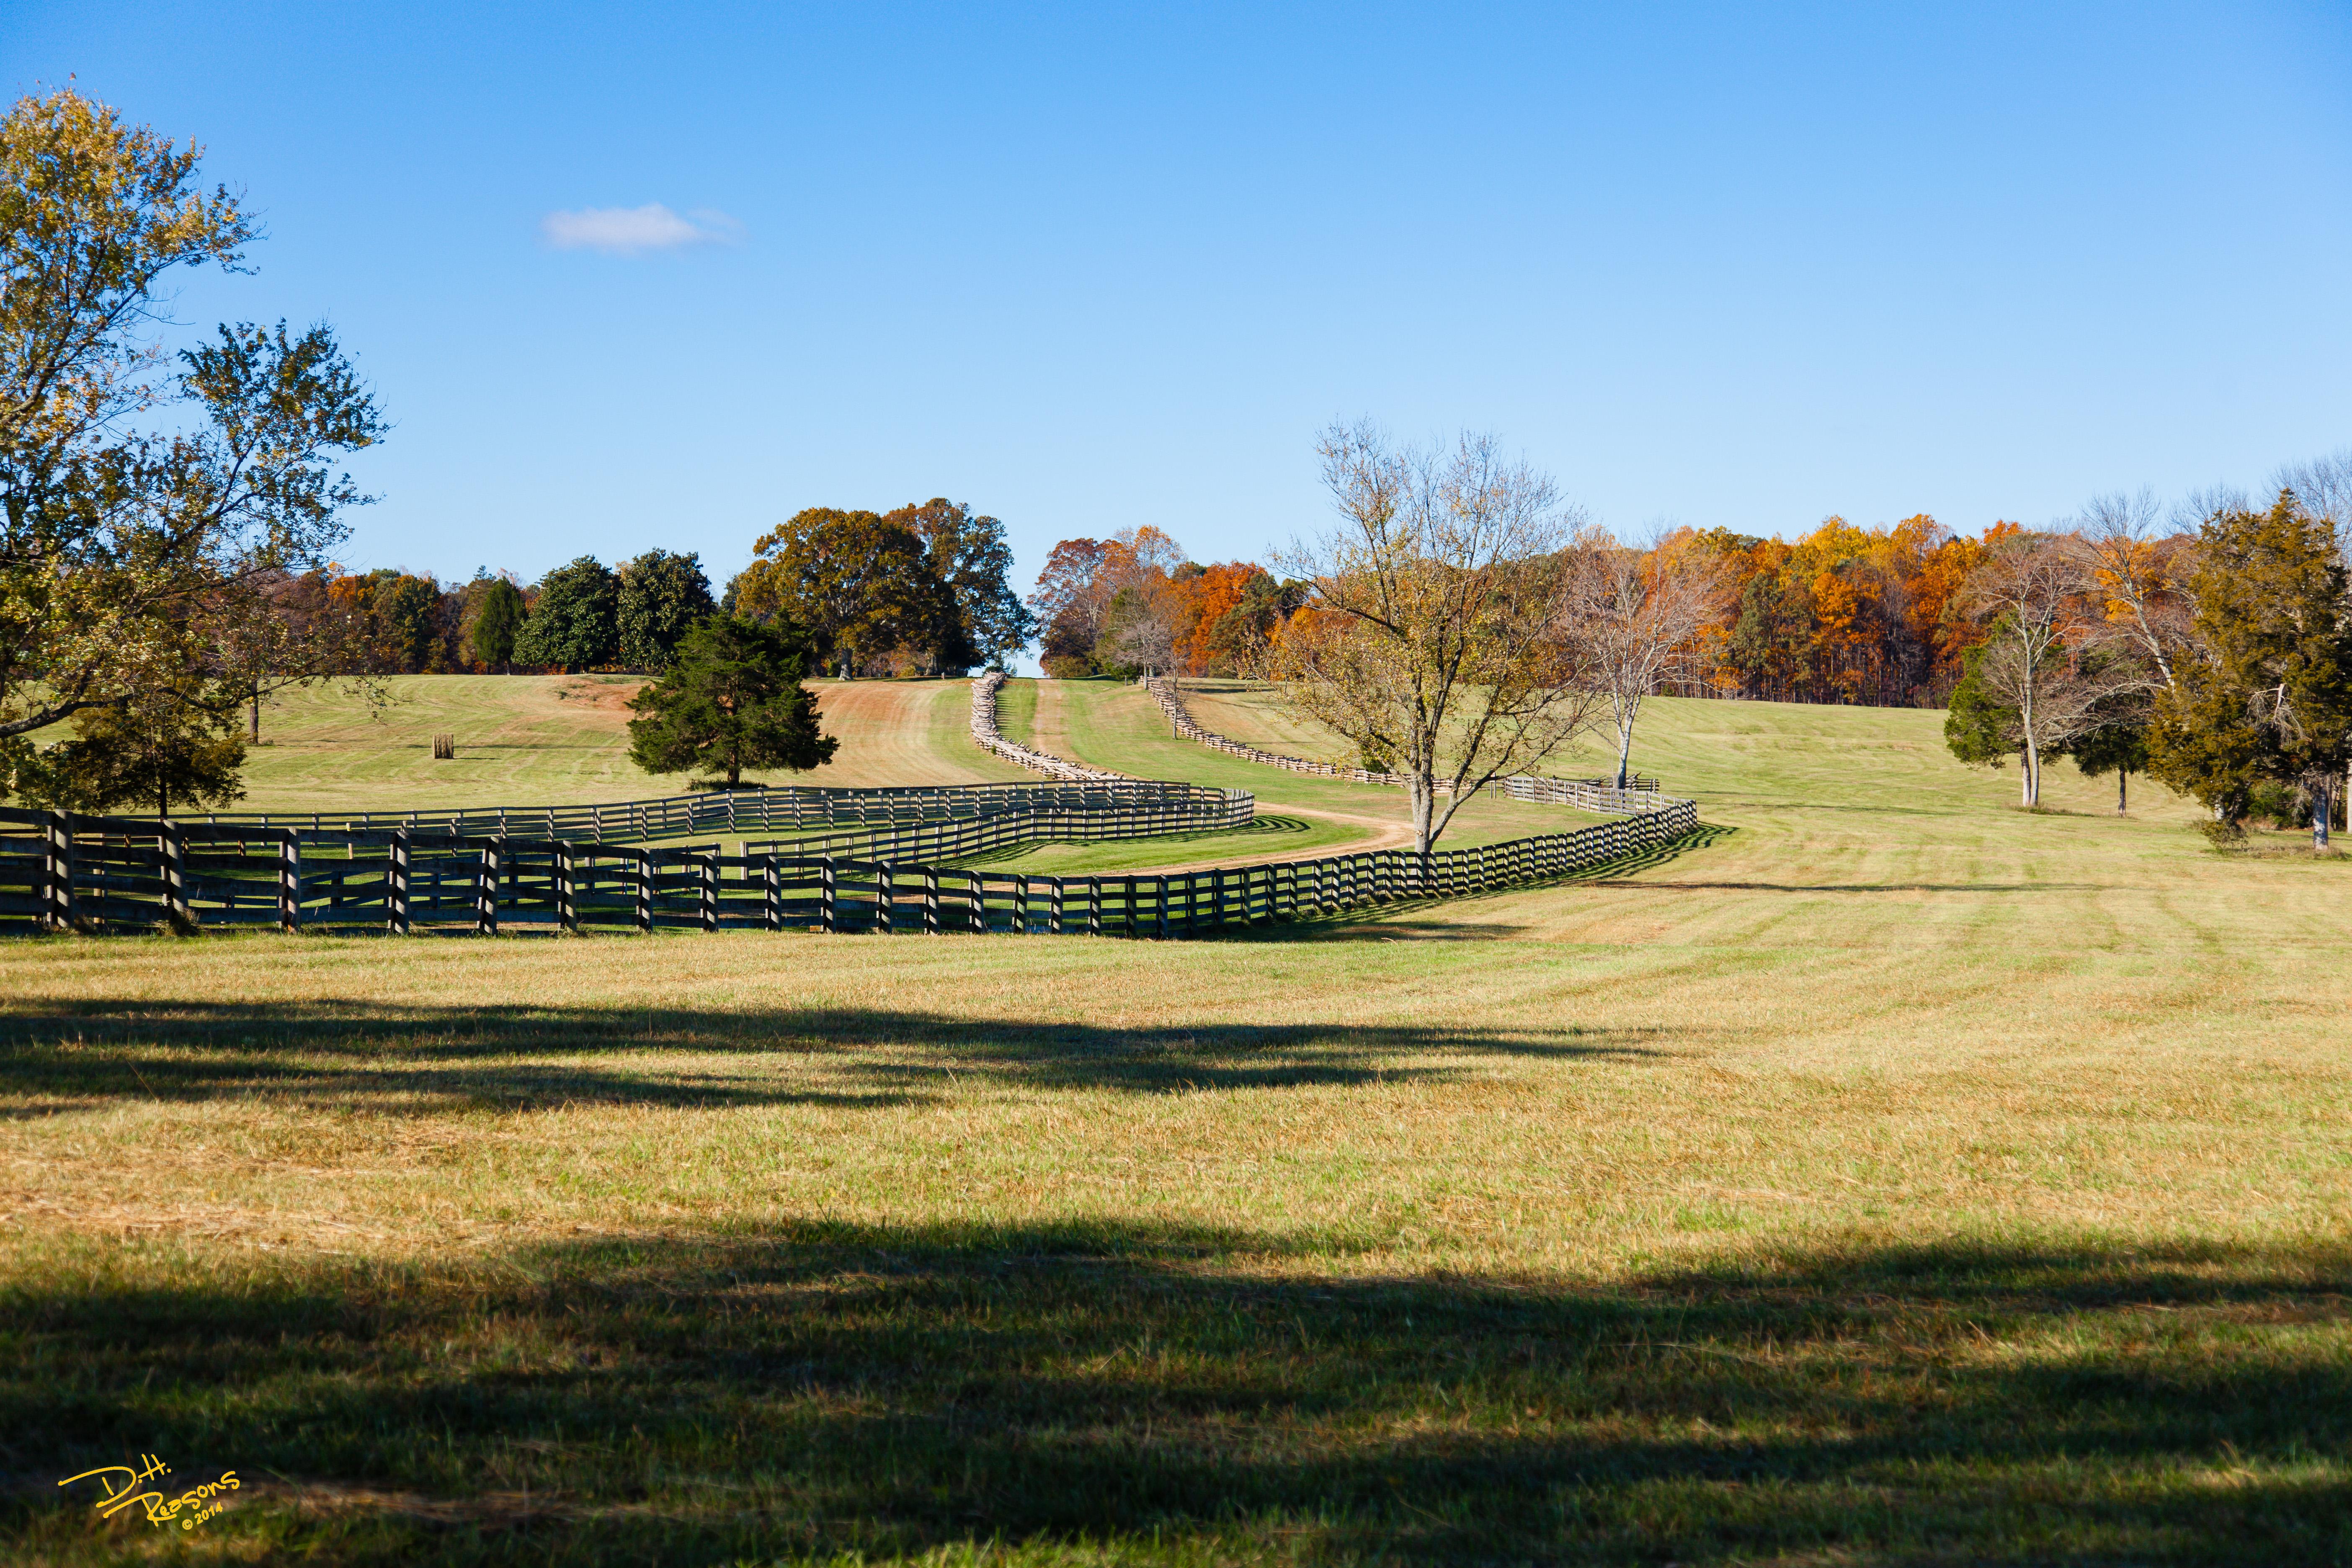 appomattox county Property tax information for appomattox county, virginia, including average appomattox county property tax rates and a property tax calculator.